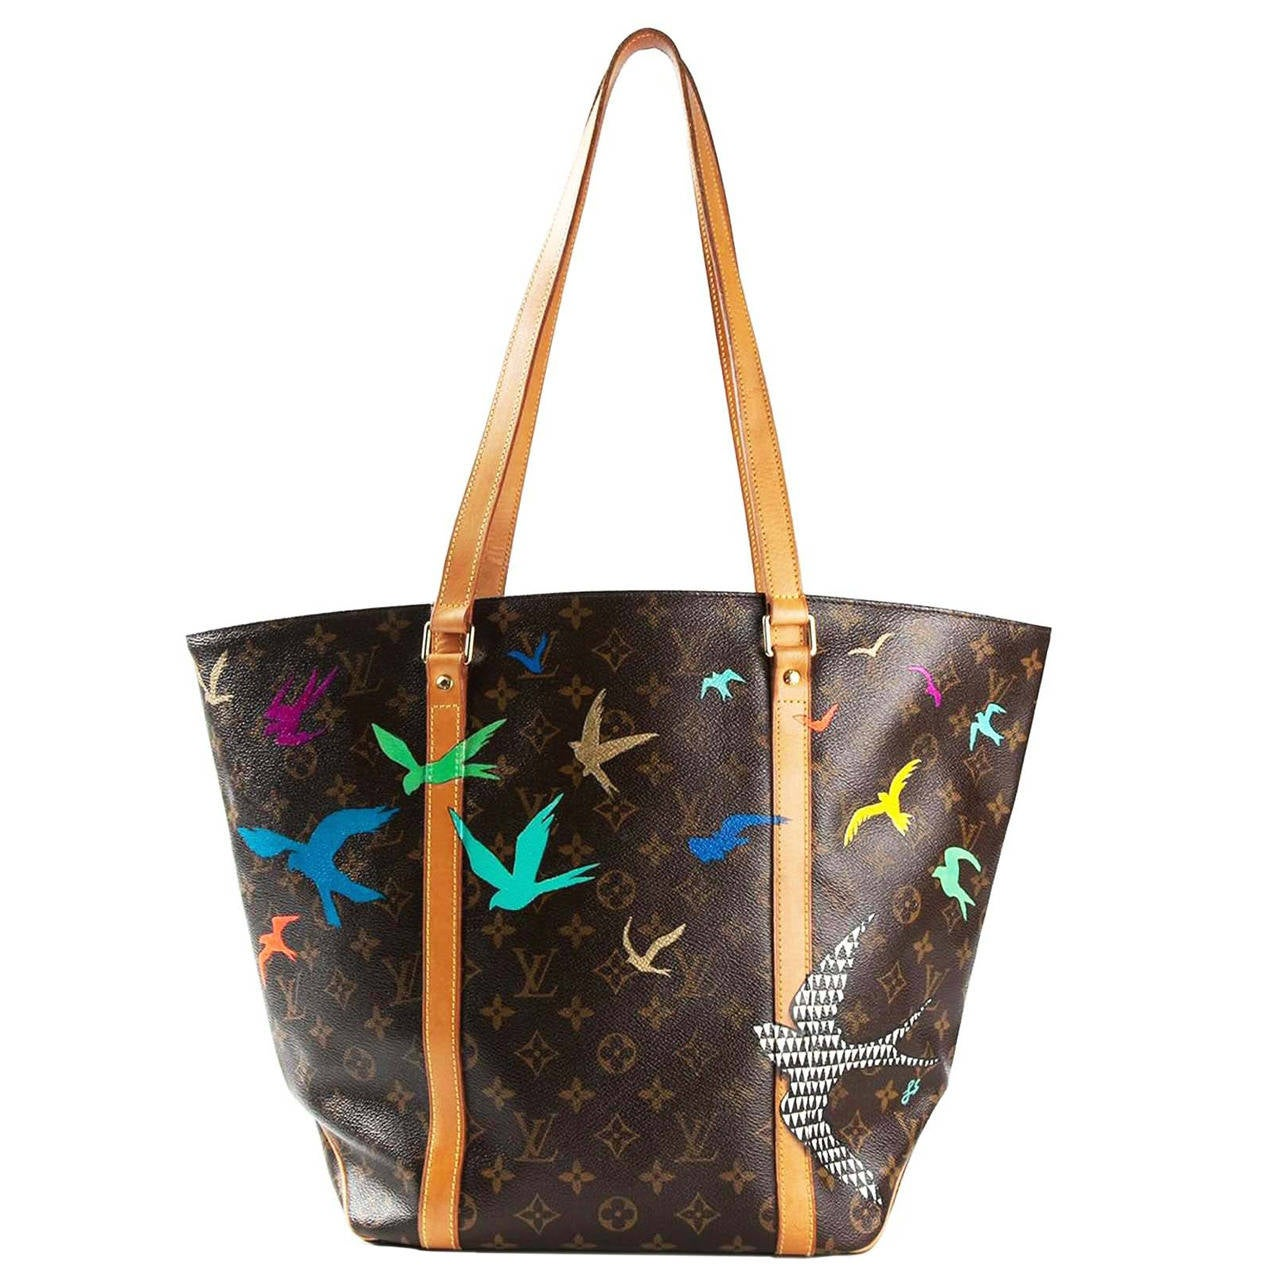 louis vuitton hand painted monogram shopper bag at 1stdibs. Black Bedroom Furniture Sets. Home Design Ideas